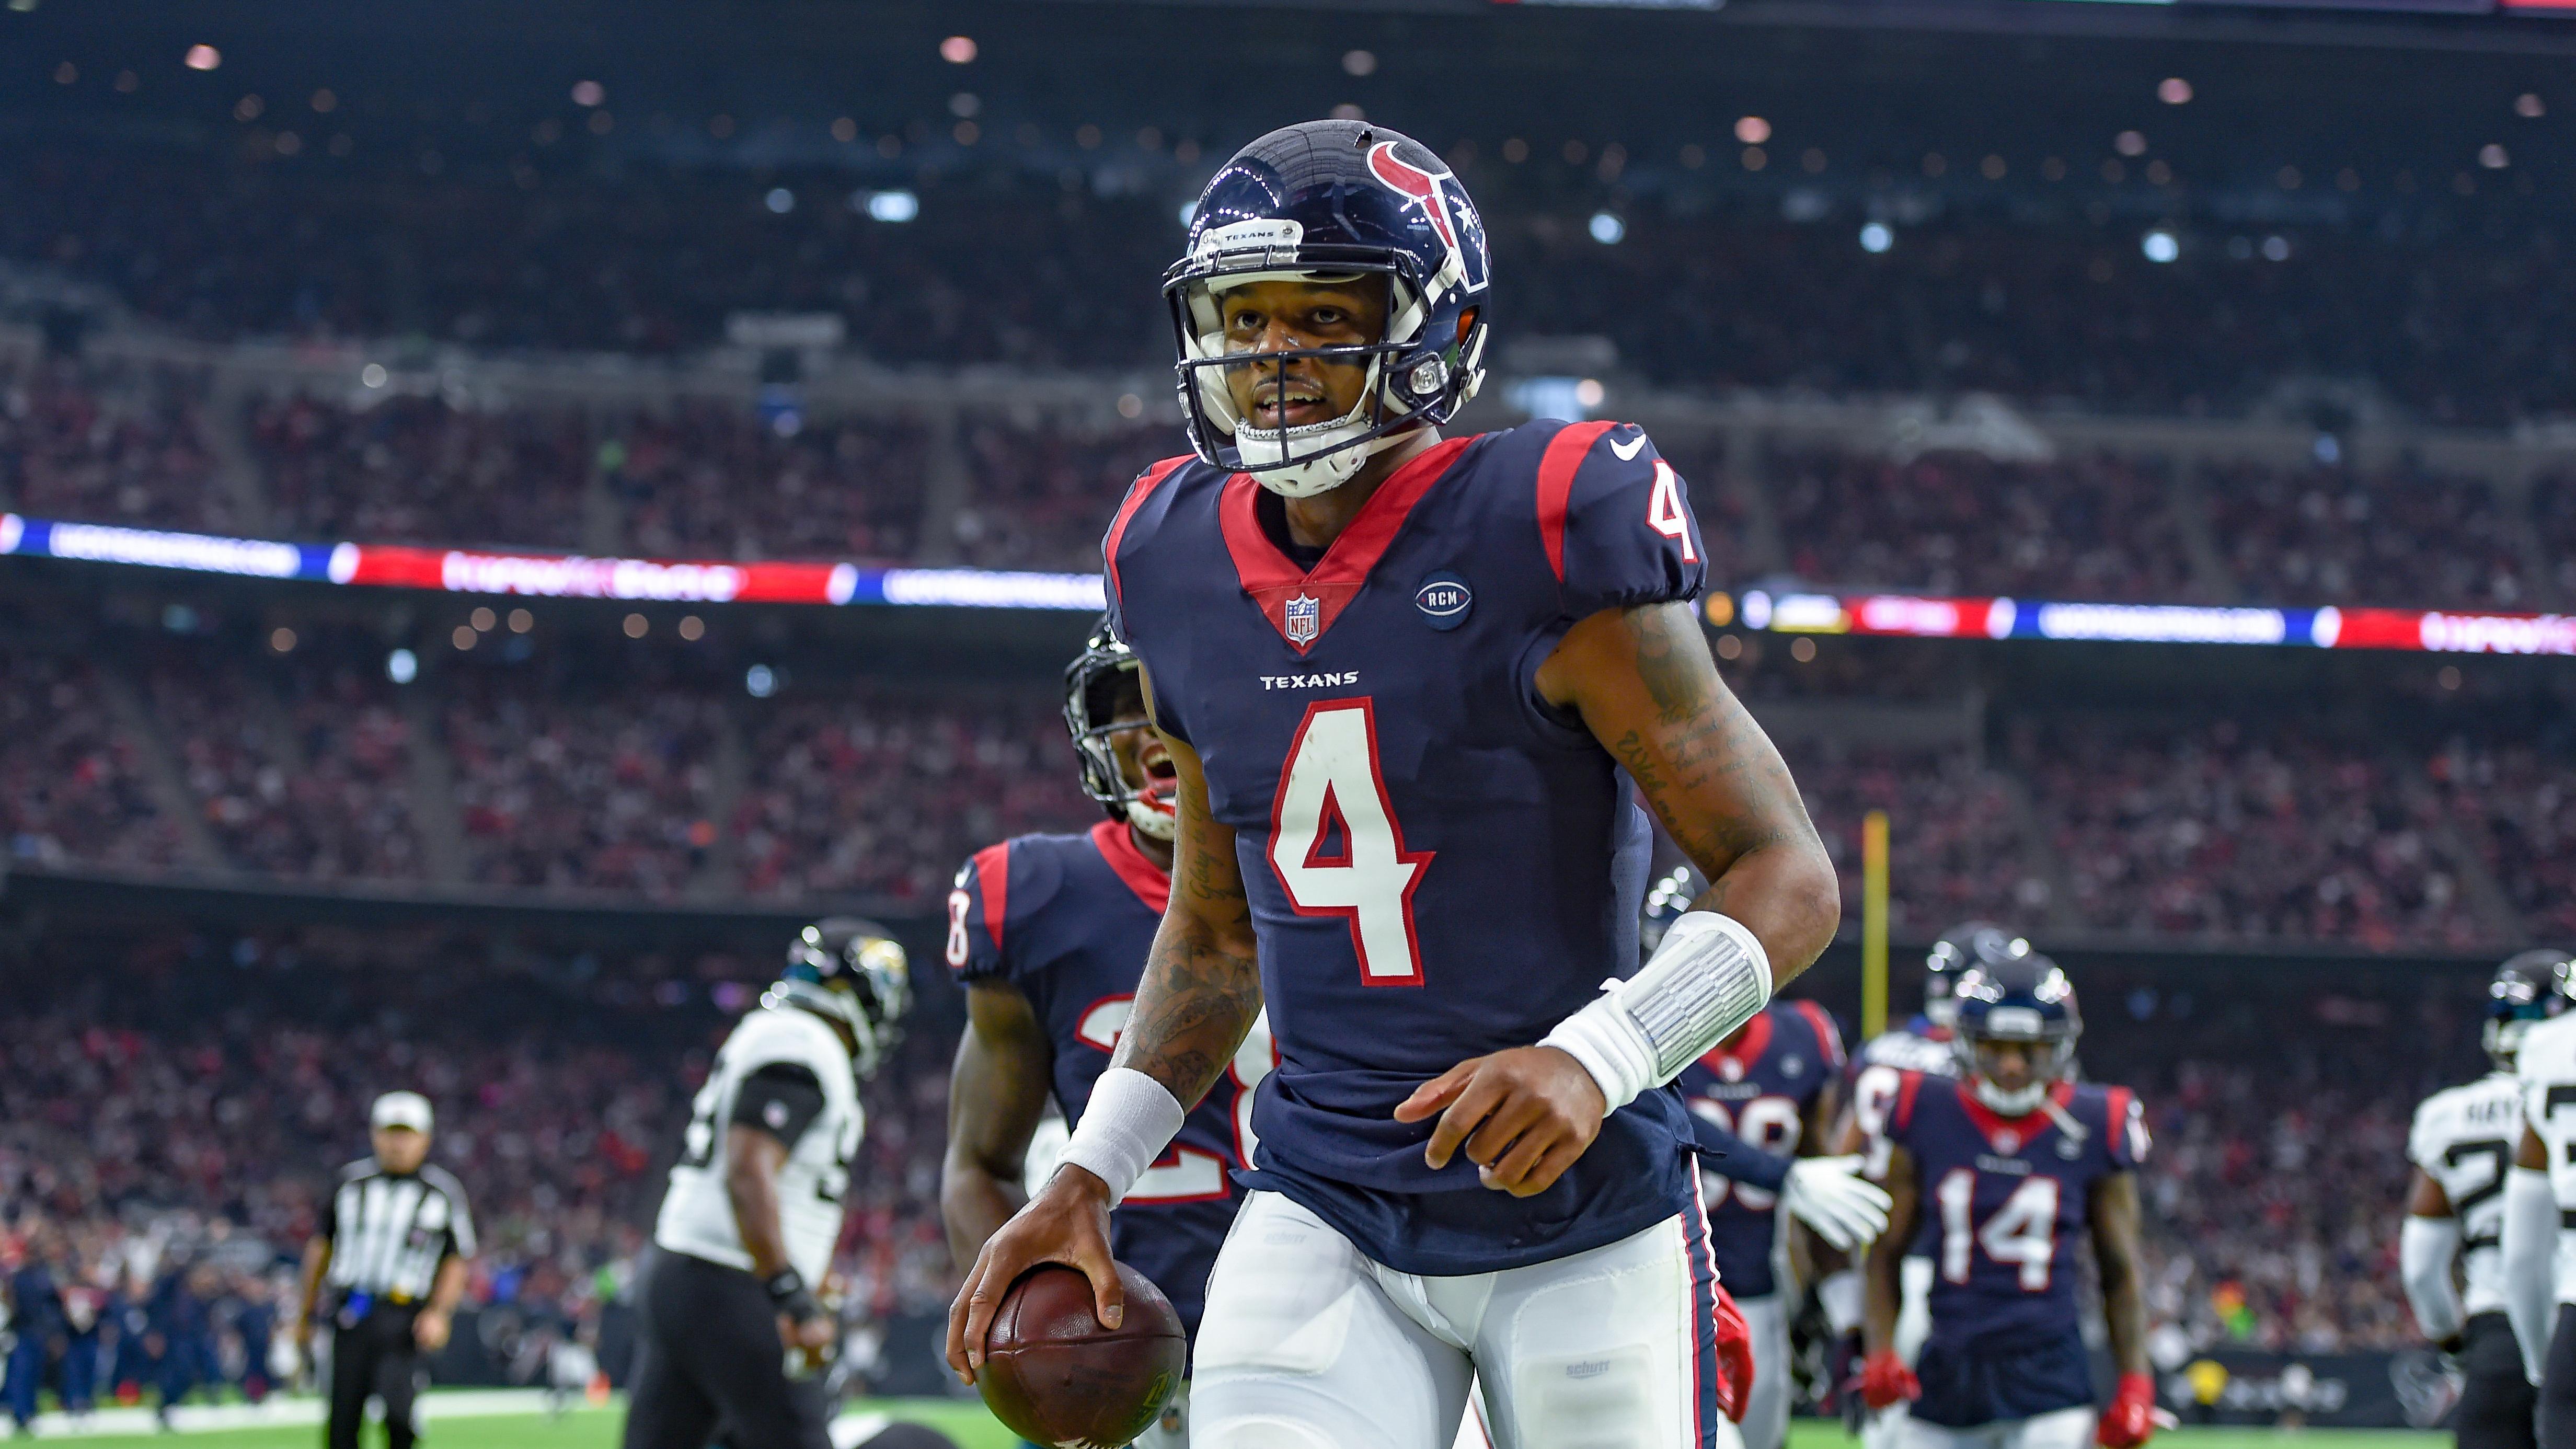 878861c6 Houston Texans draft picks 2019: Grades, analysis, list | SI.com